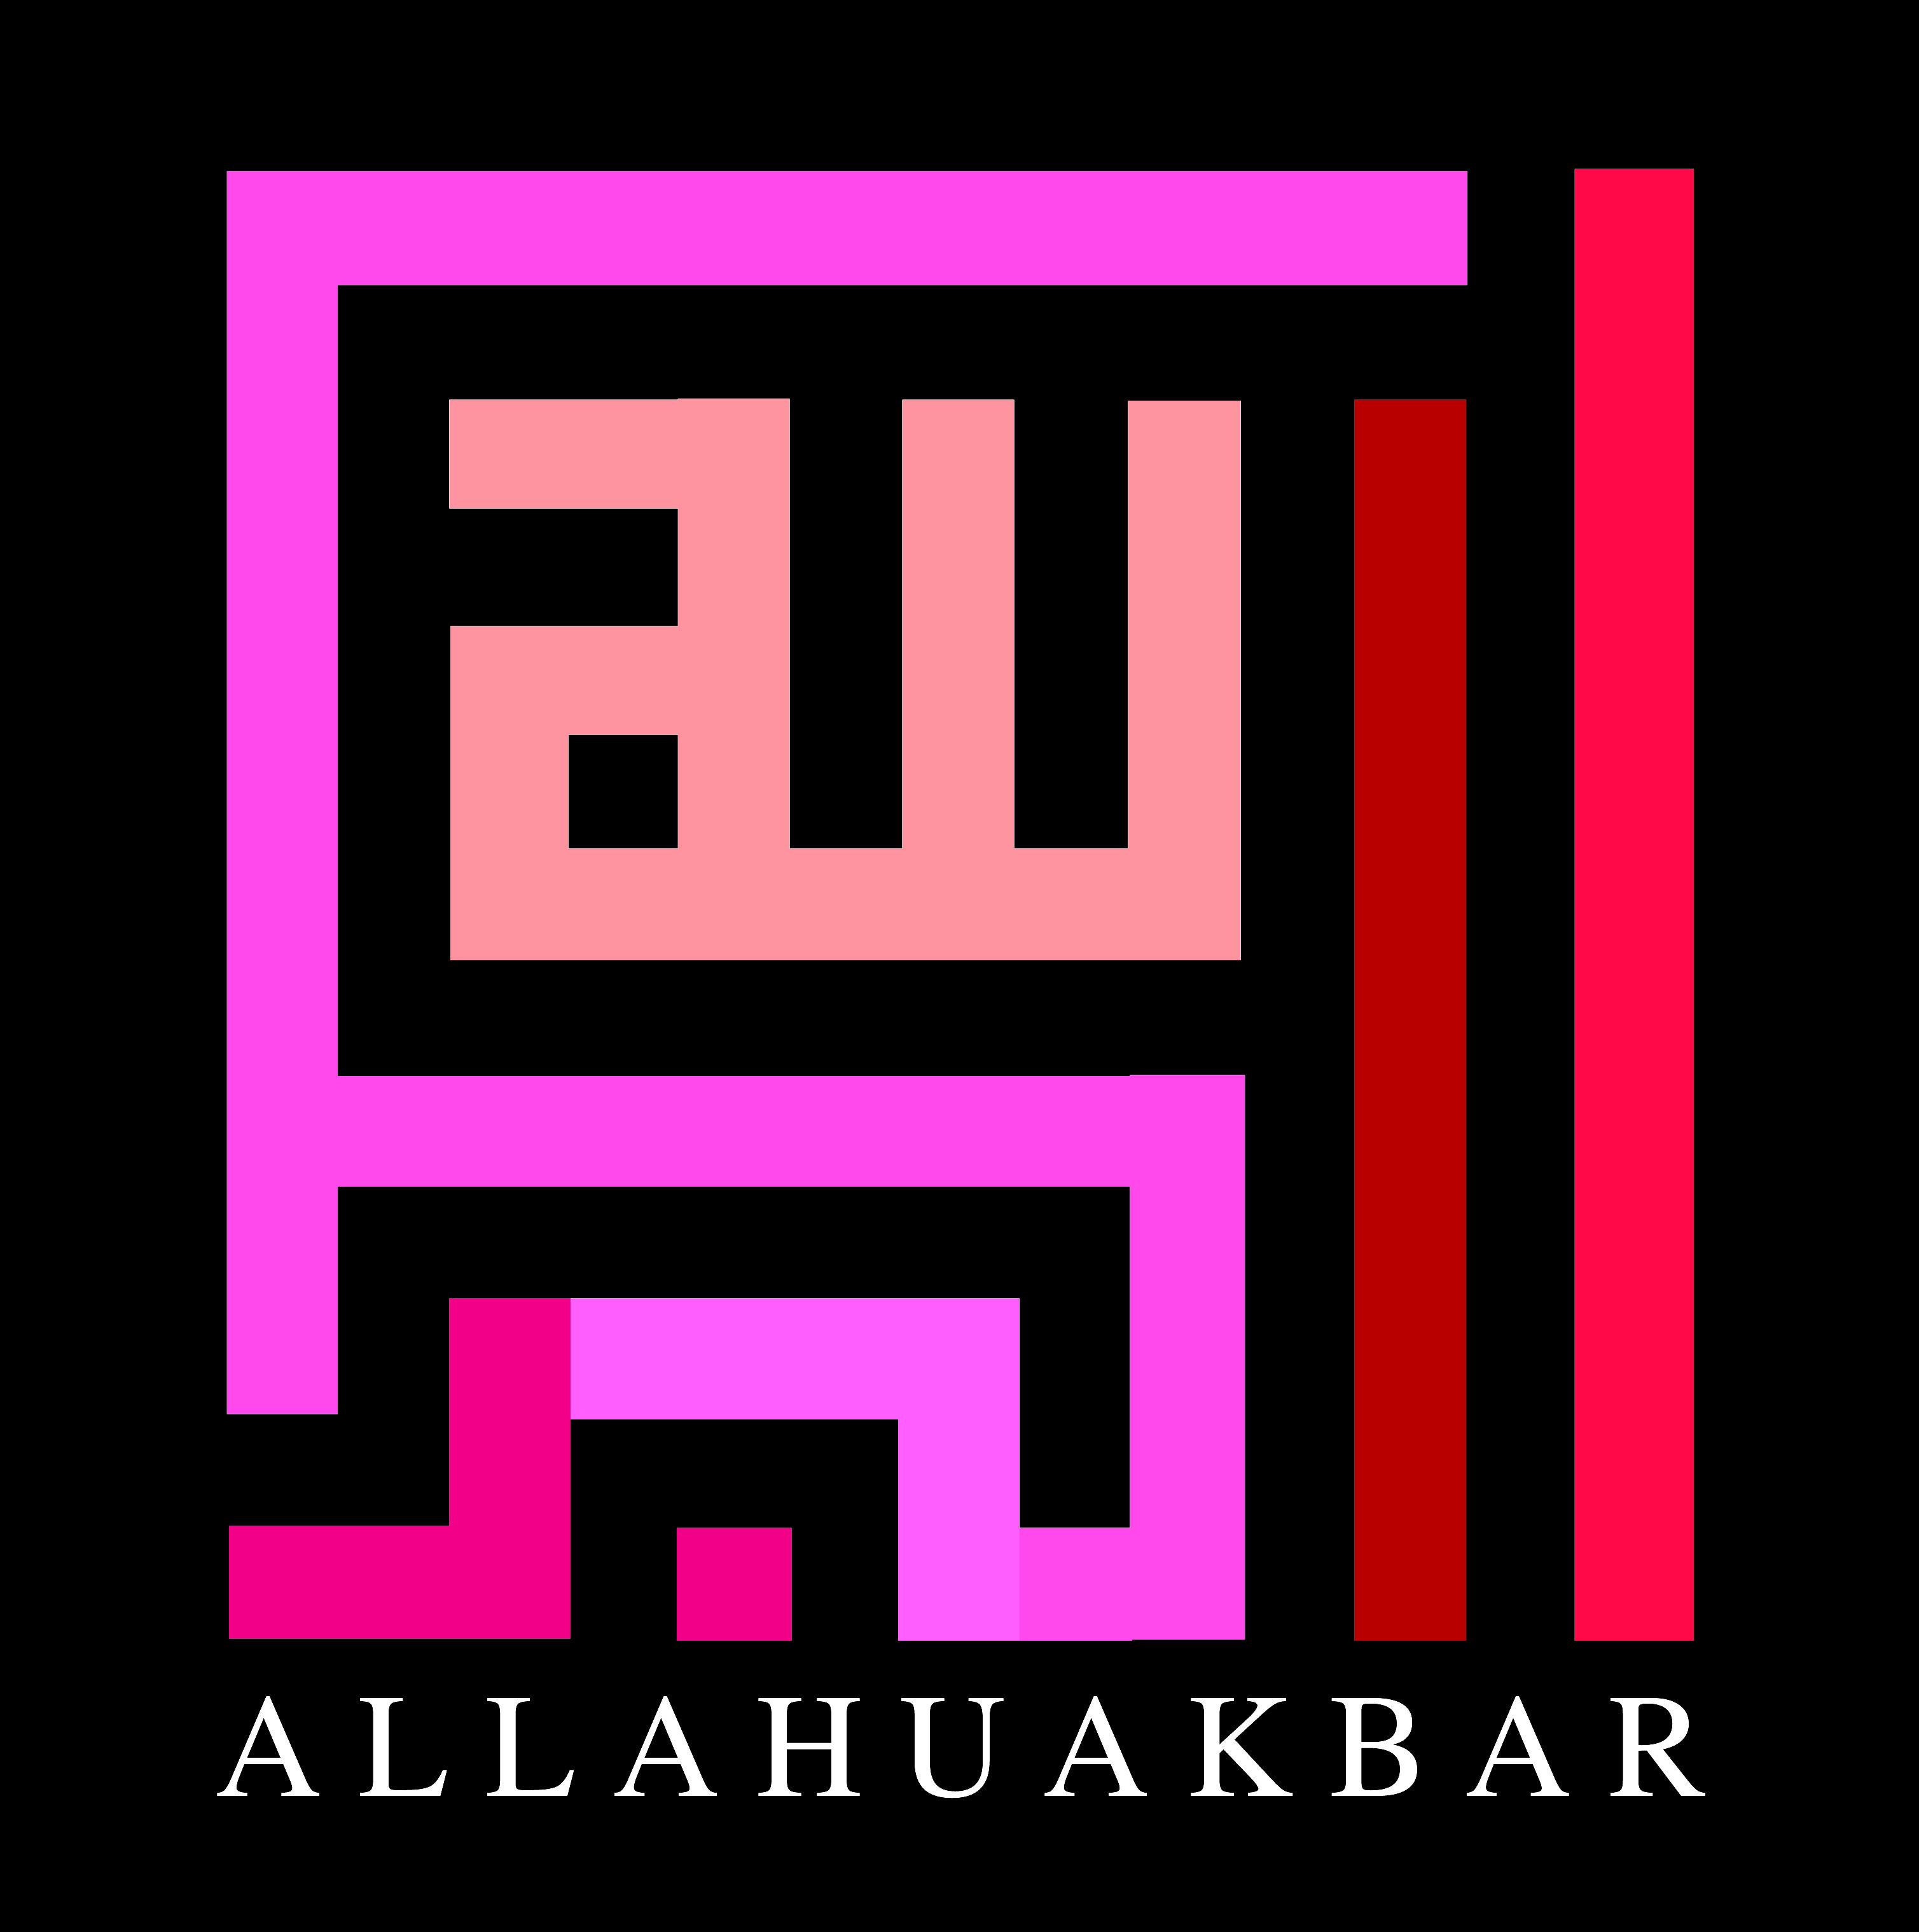 Allahuakbar Seni Kaligrafi Seni Kaligrafi Arab Inspirasional